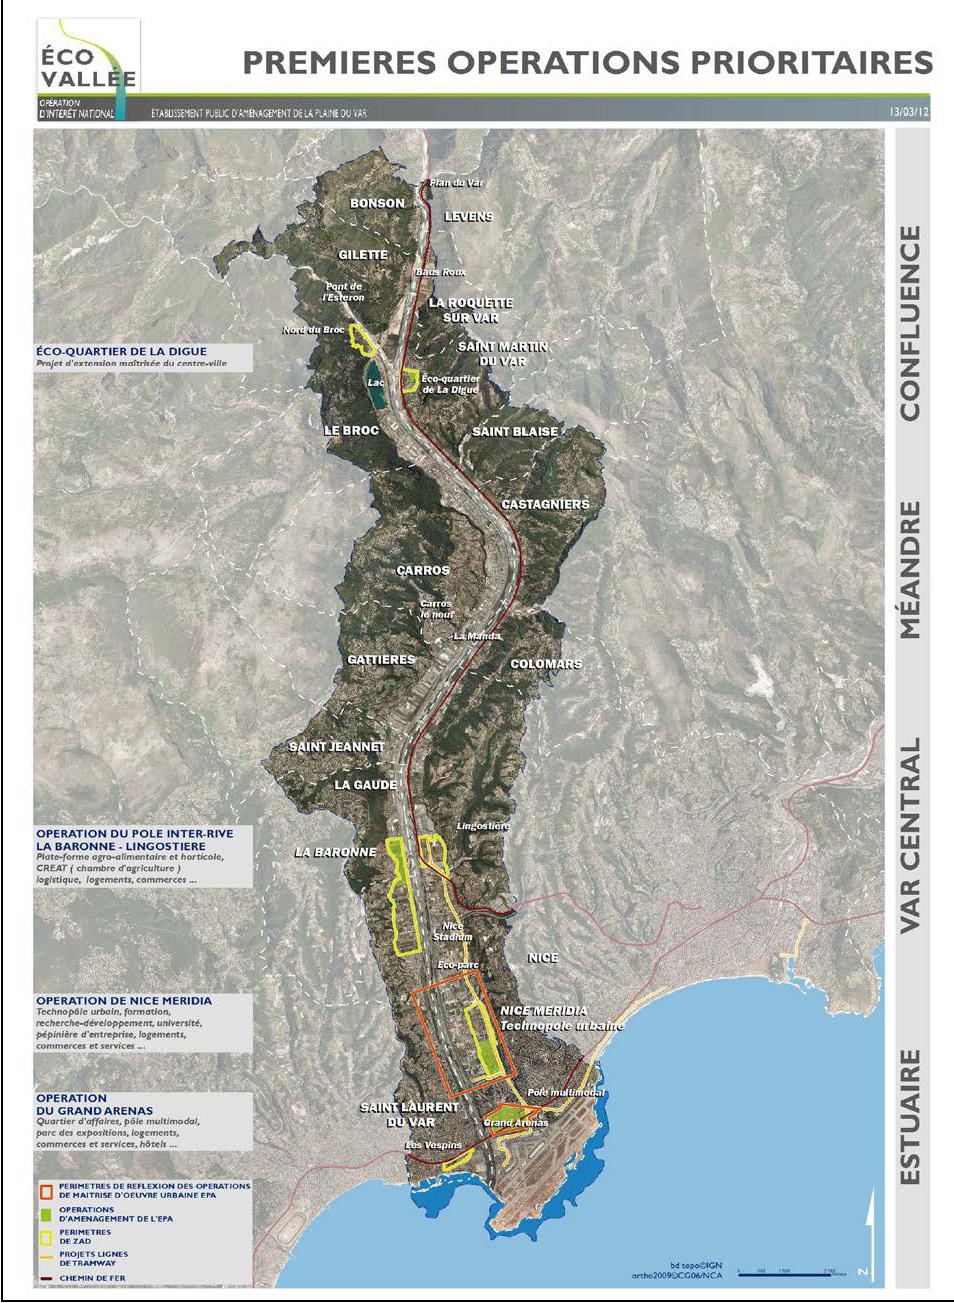 carte: Premières opérations prioritaires Eco-Vallée (2012-11)